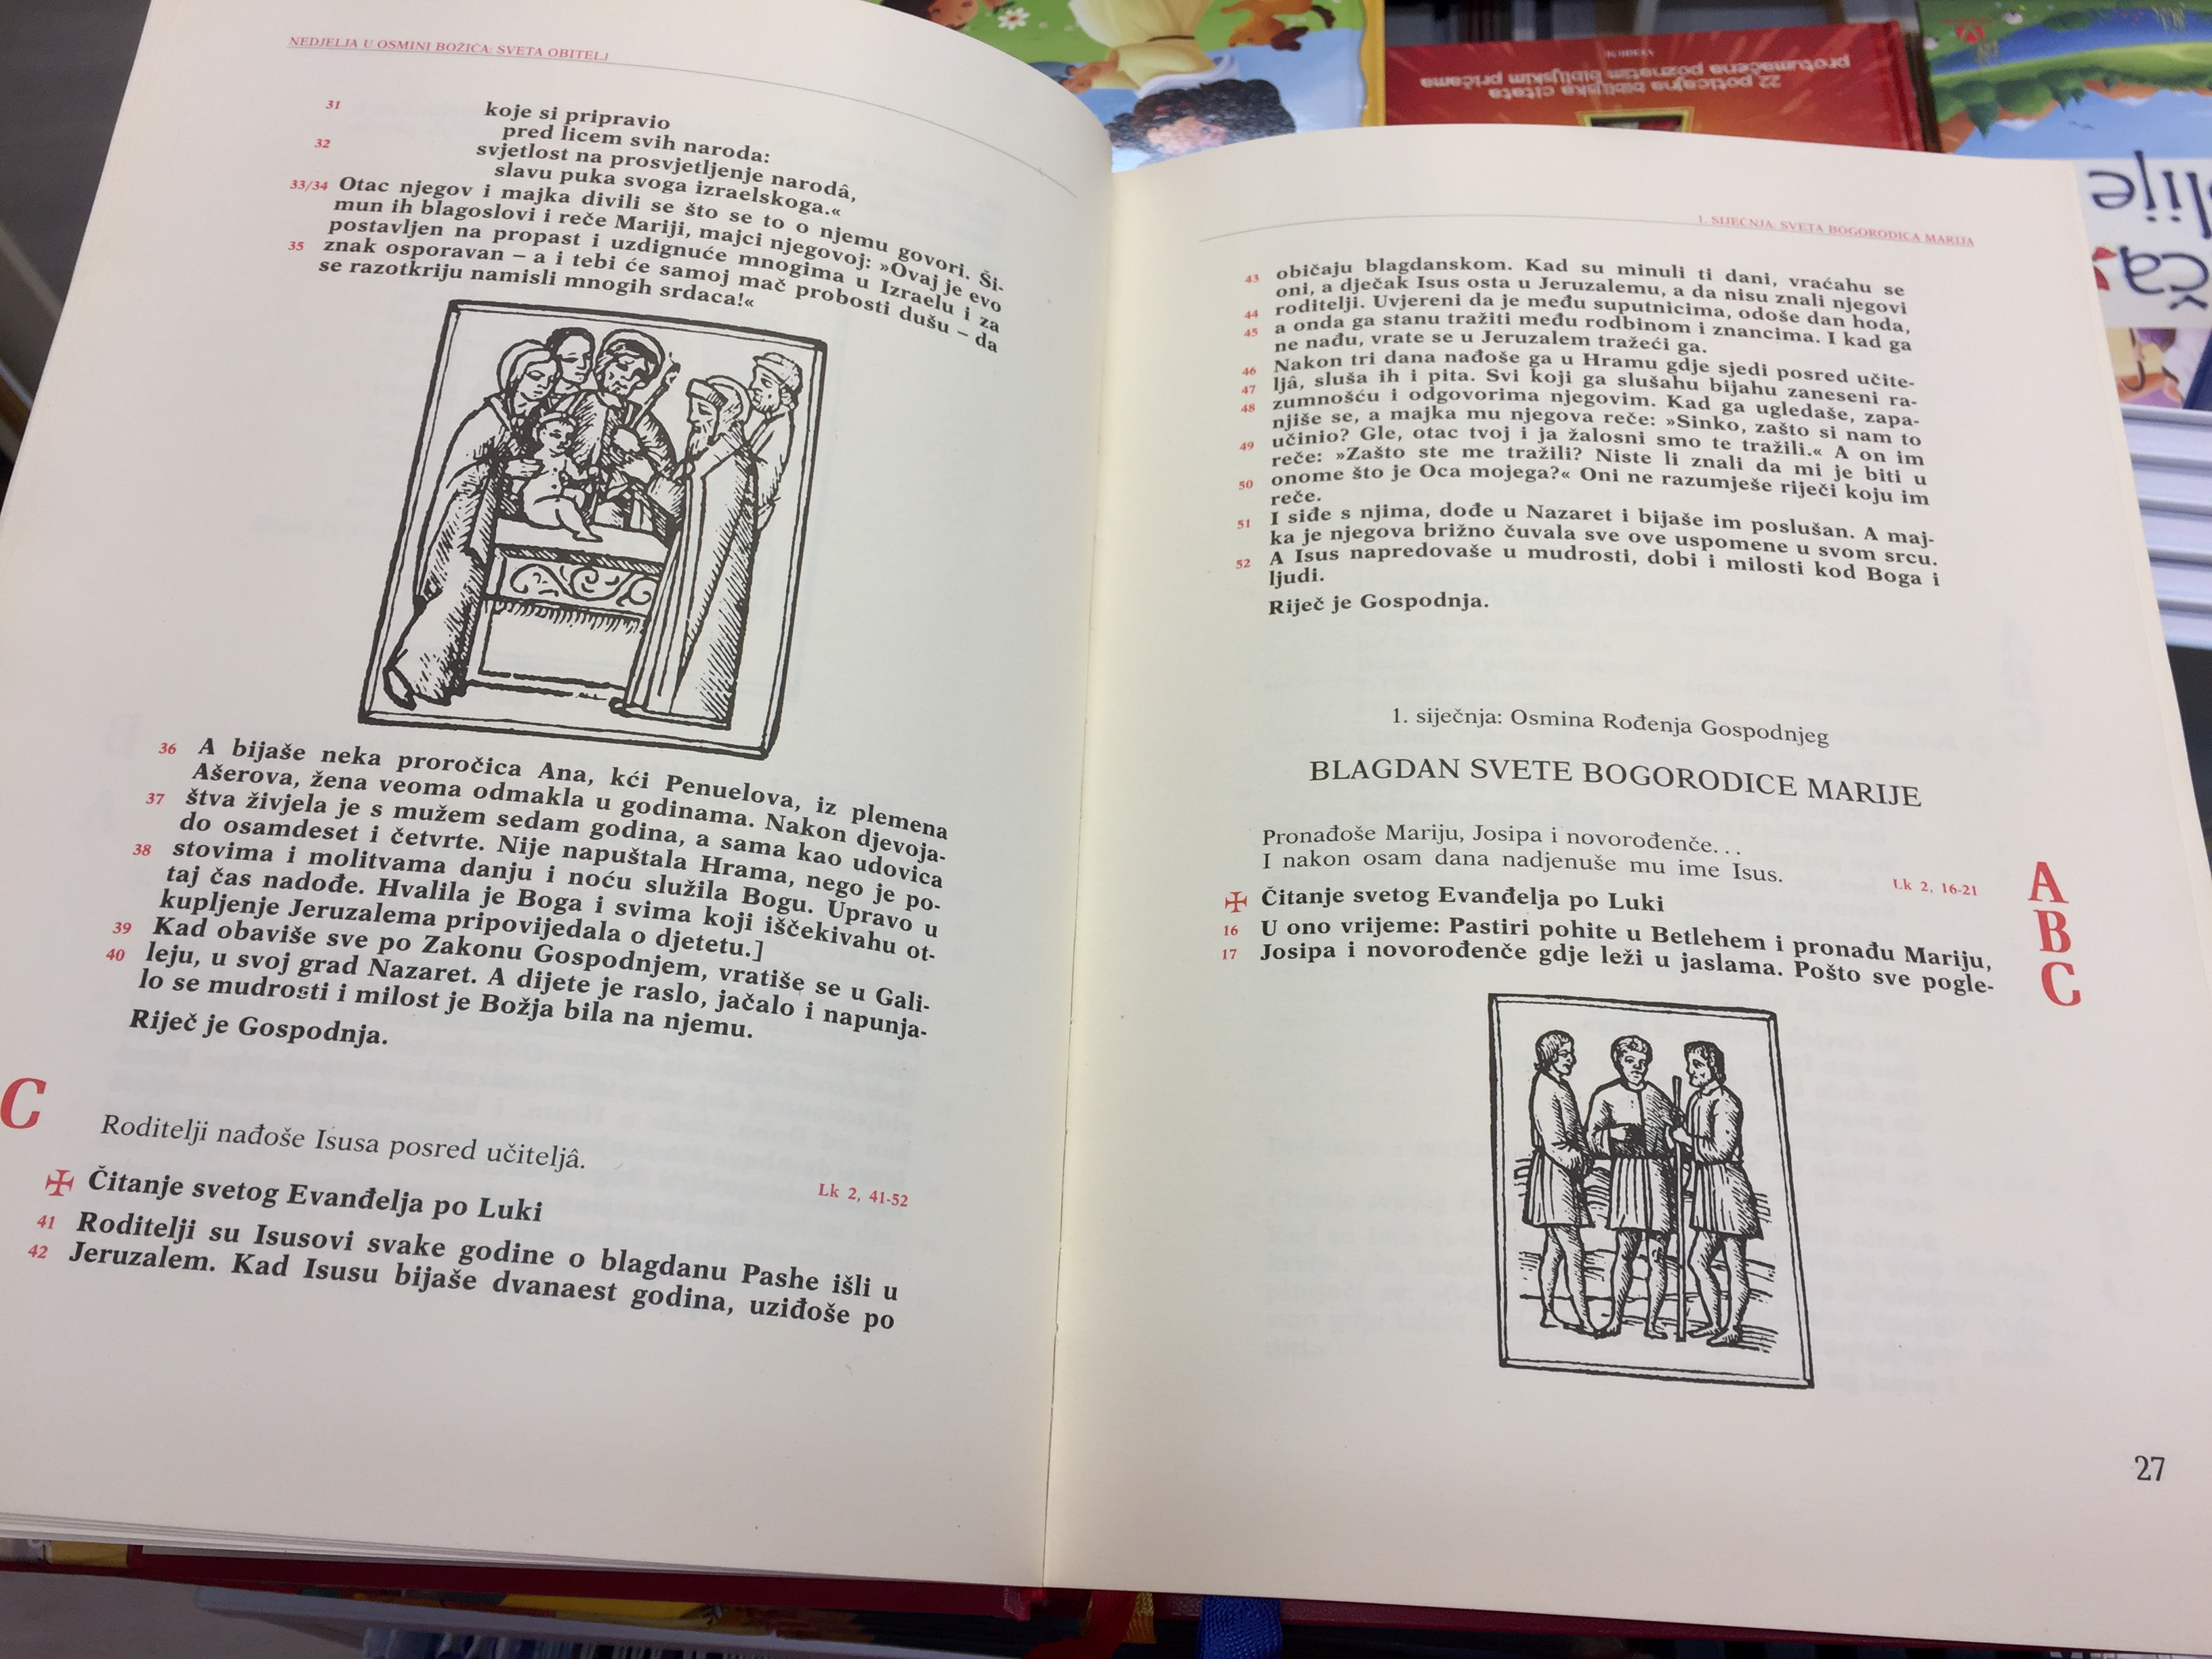 -evan-elistar-i-etveroevan-elje-rimski-misal-croatian-language-roman-missal-the-4-gospels-9.jpg